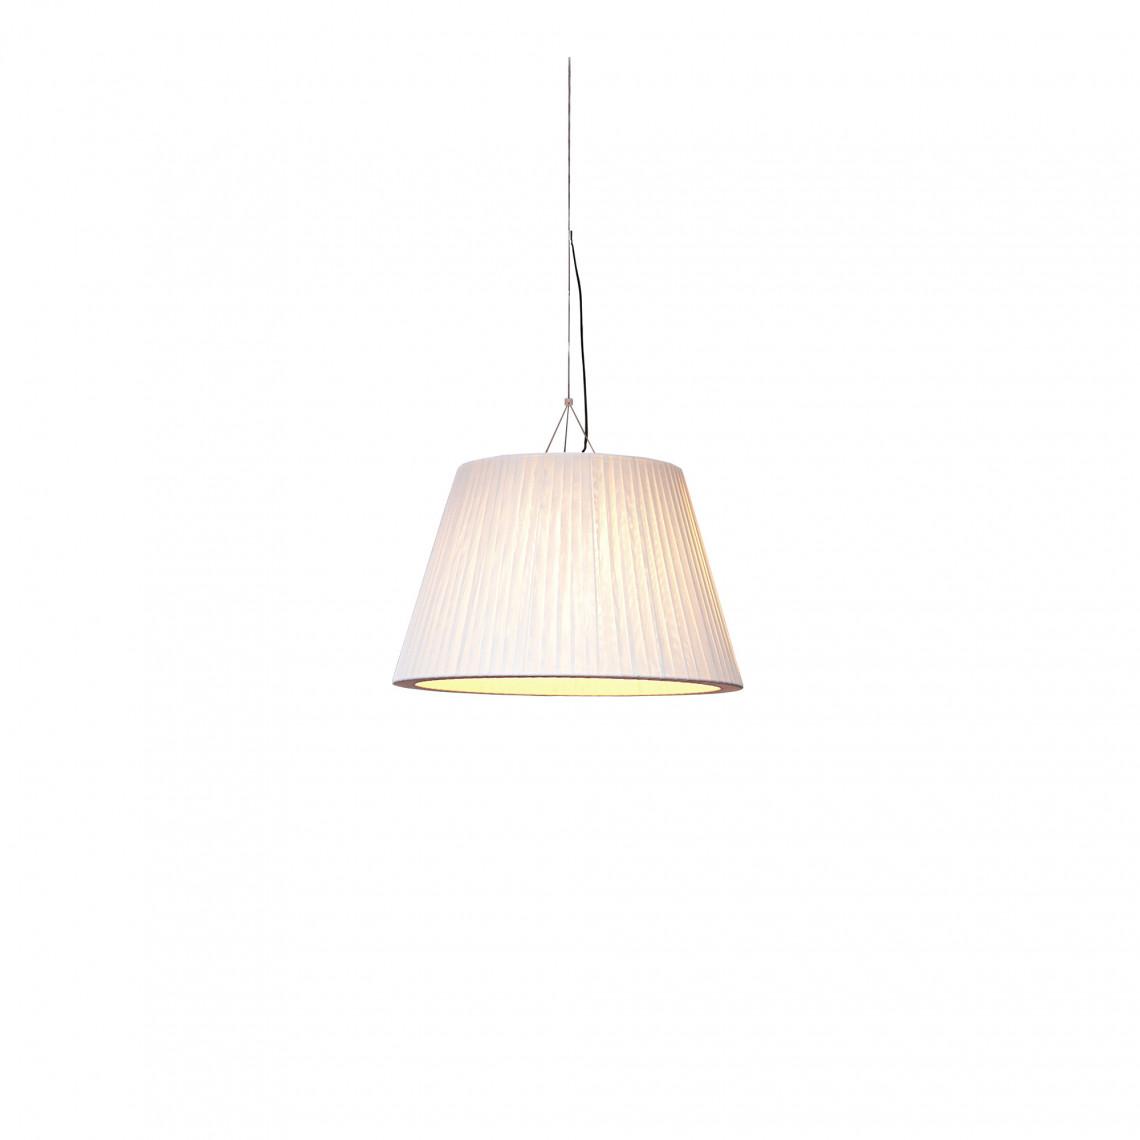 TXL Outdoor - Pendant Lamp